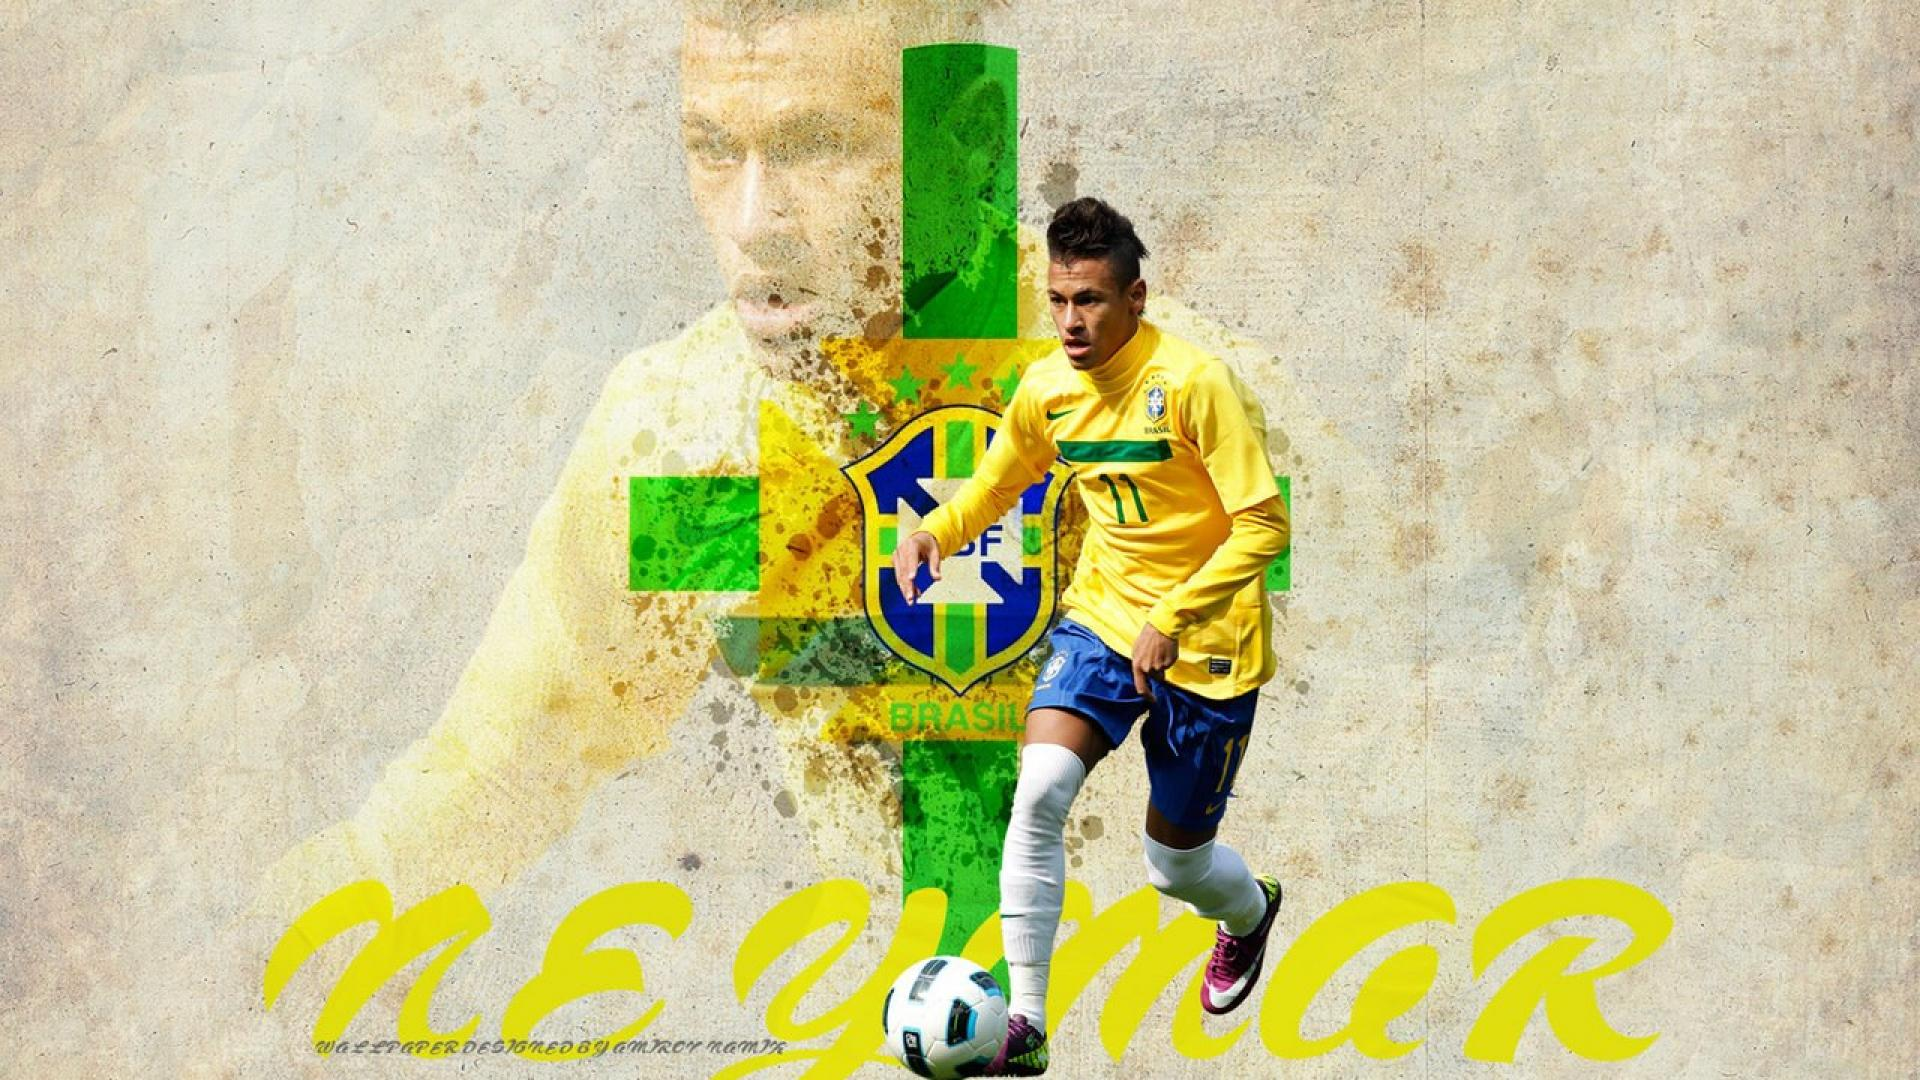 Neymar Wallpaper 6